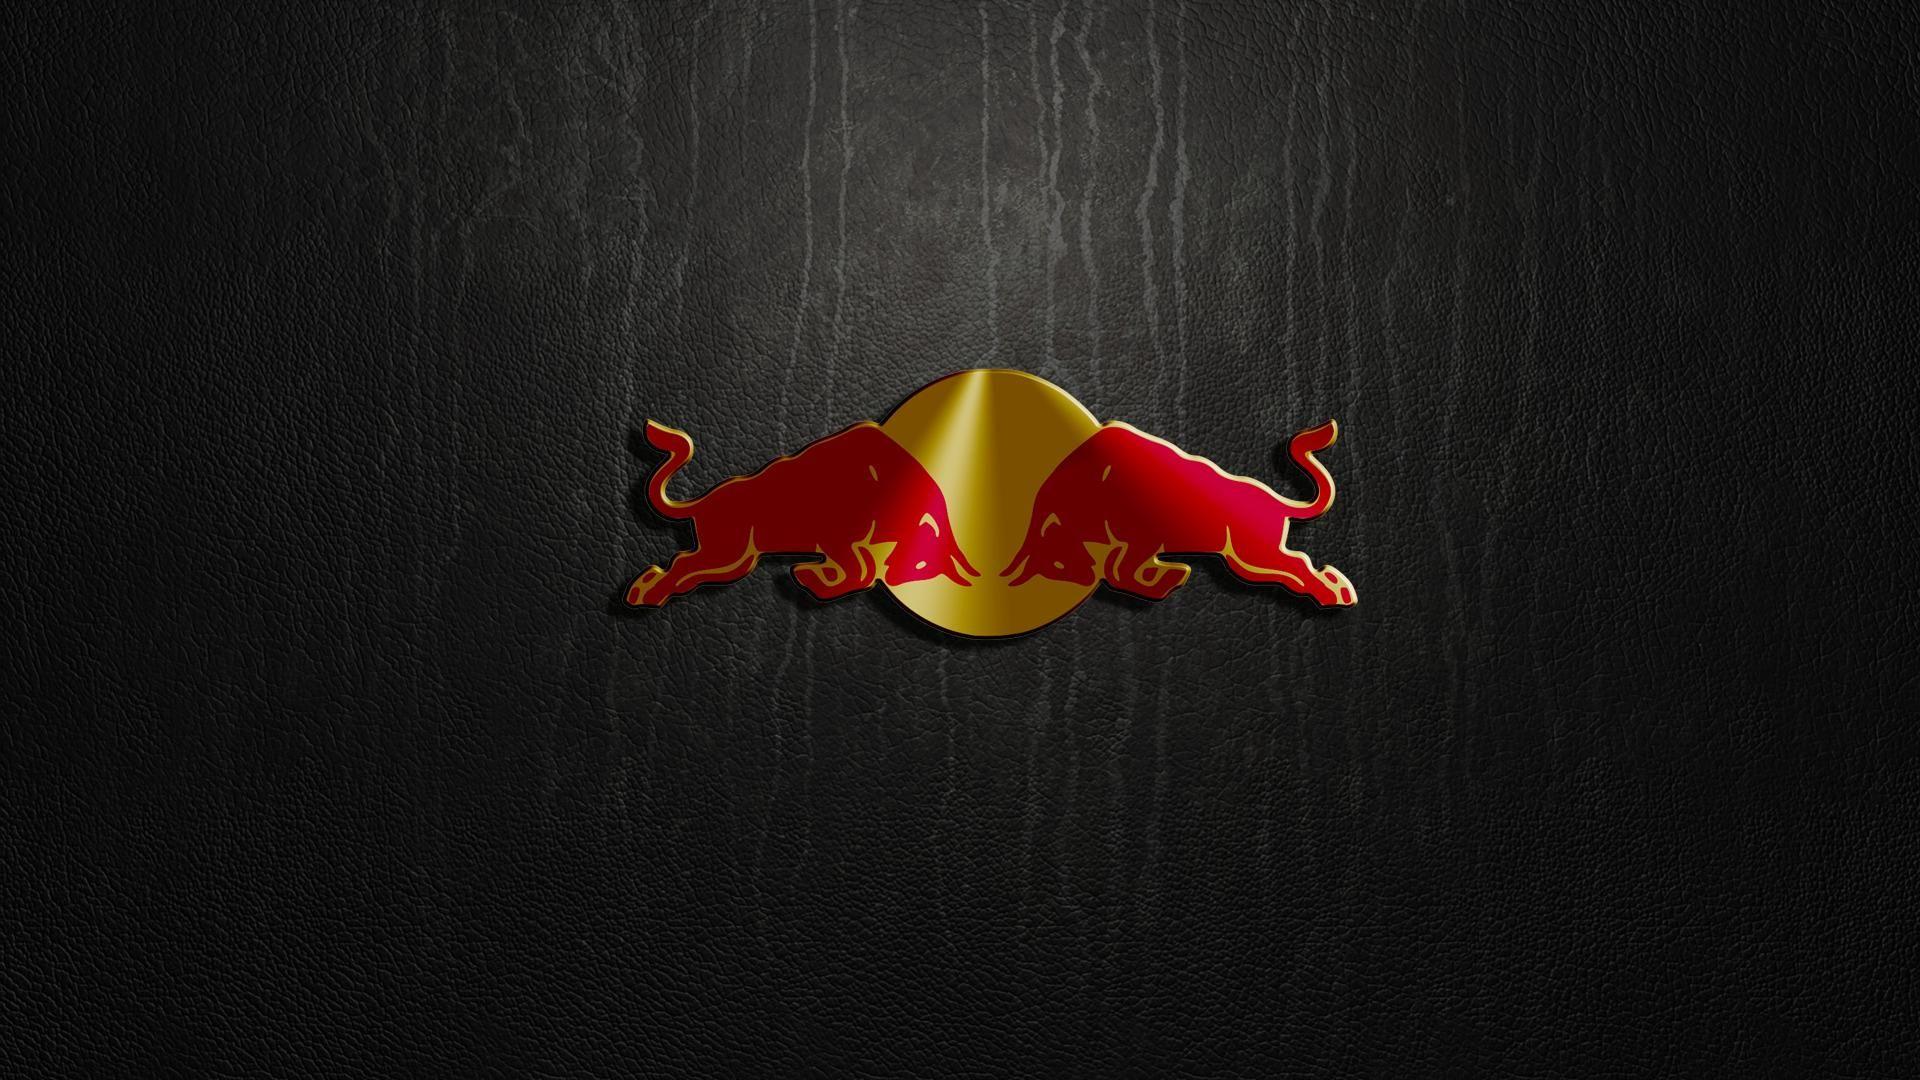 red bull logo wallpaper. | hd wallpapers | pinterest | bulls